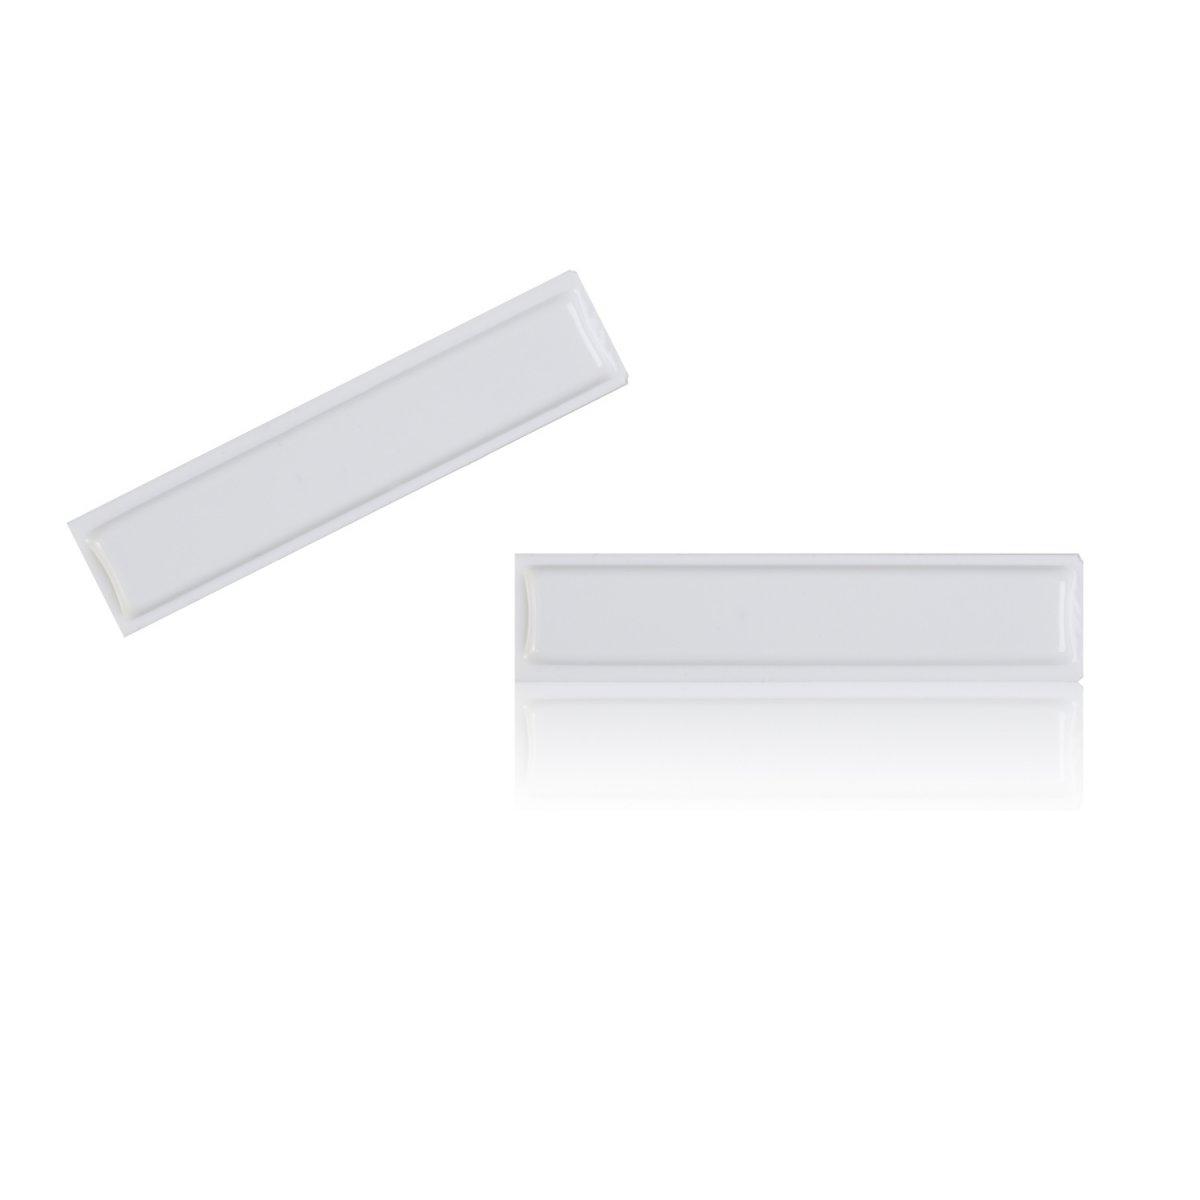 Alarme adesivo acústico magnético branco